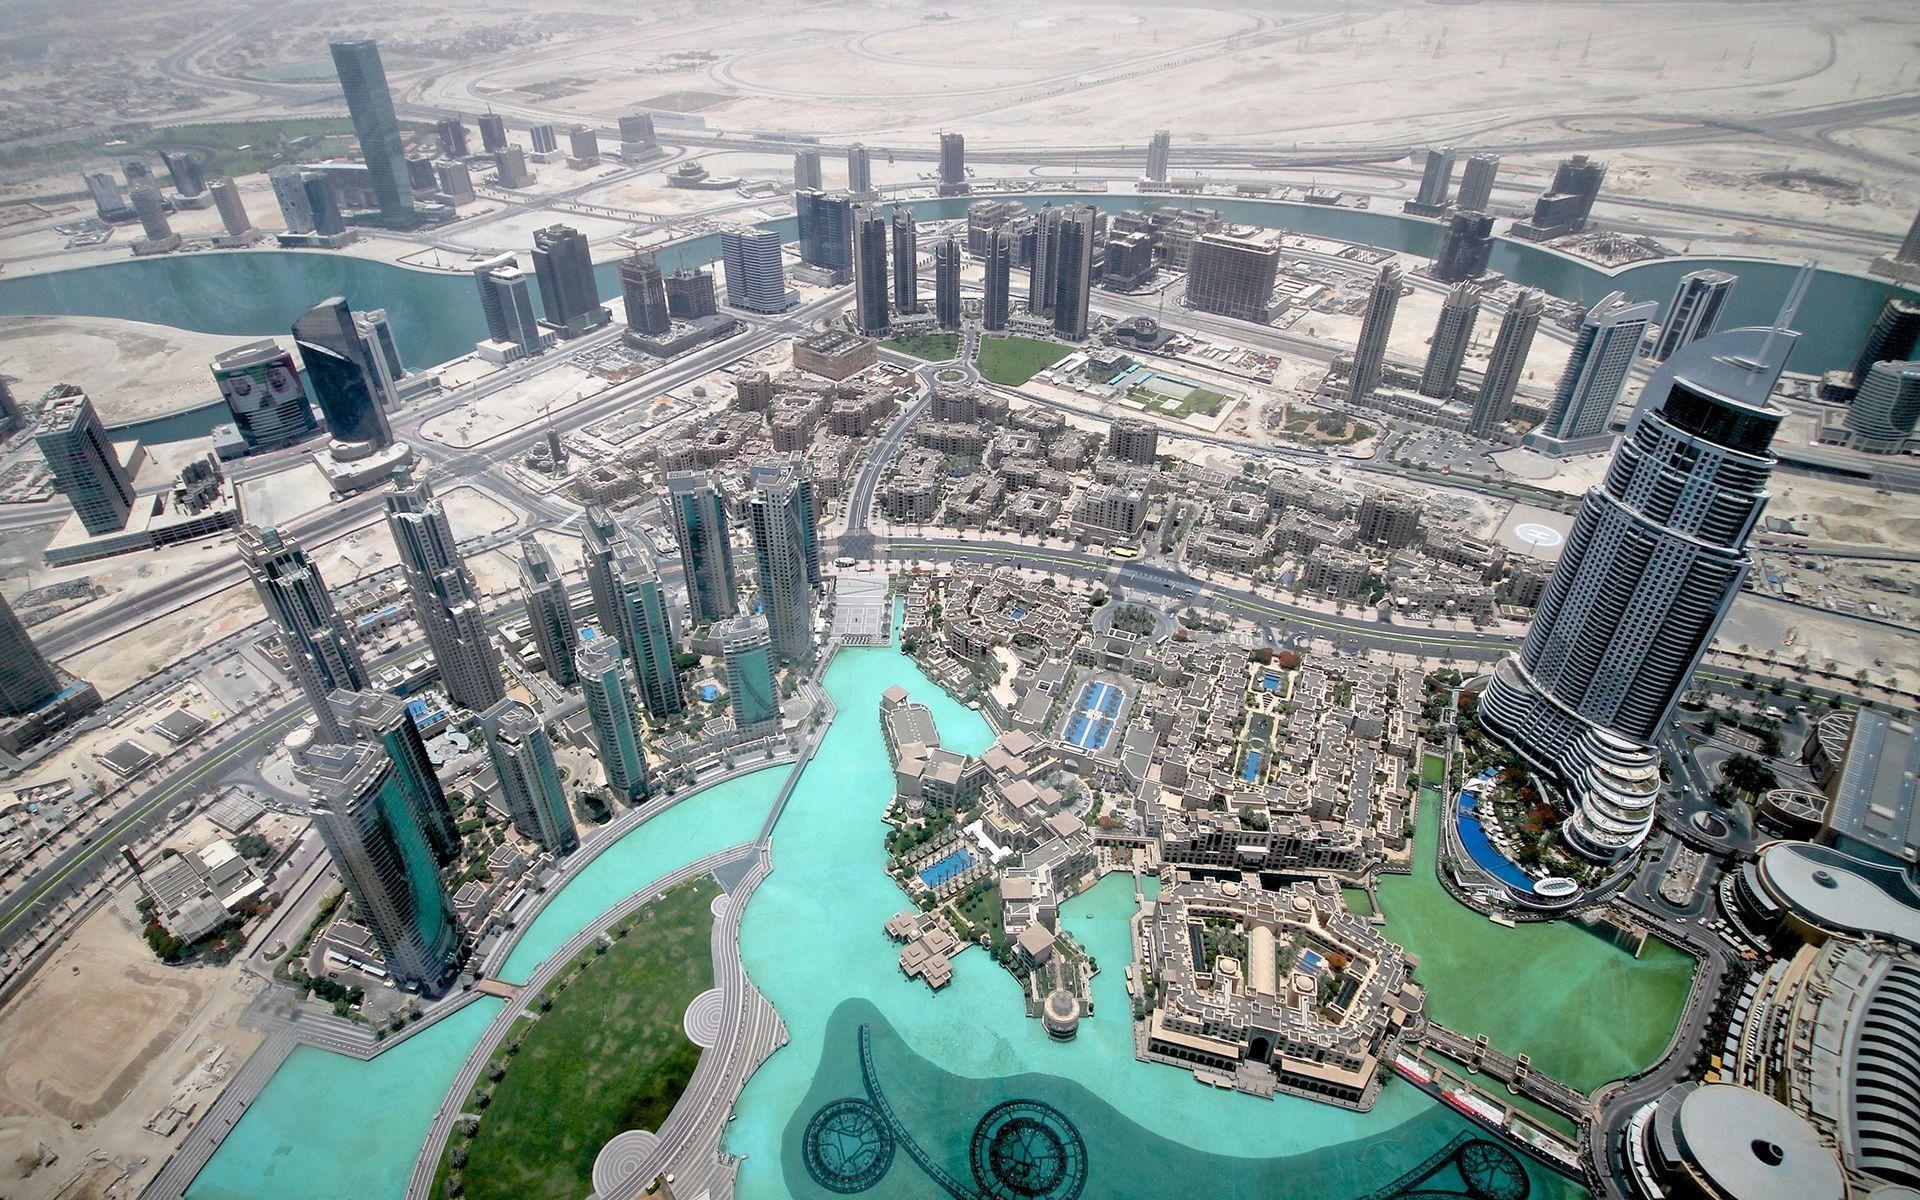 4K UHD 3840x2160 - Dubai Bird's Eye View